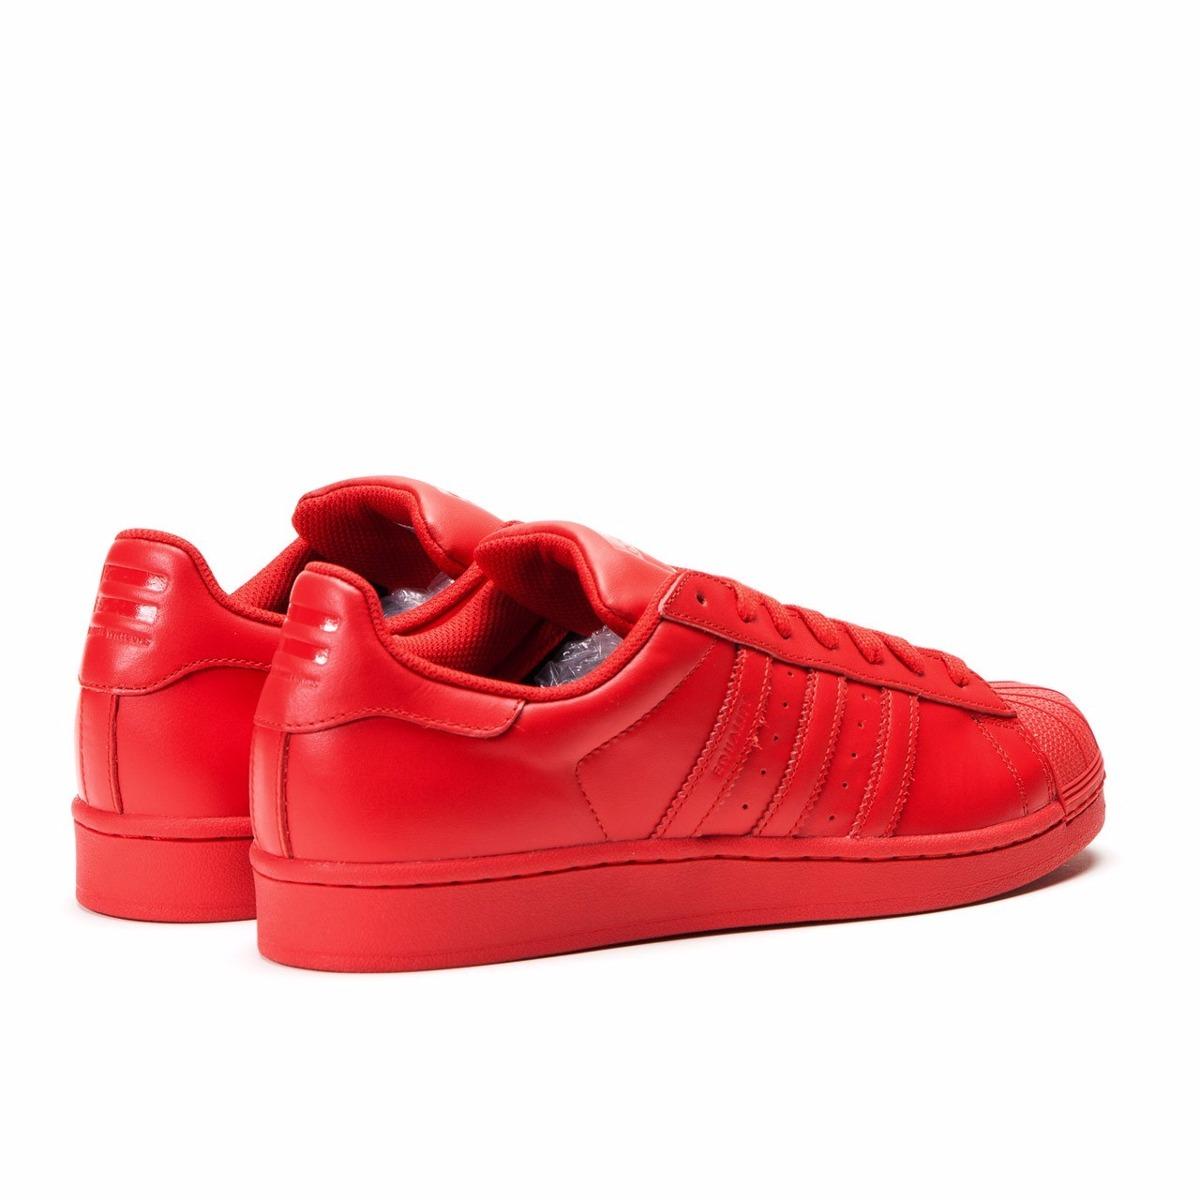 674f8c862588b zapatillas adidas clasicas mujer